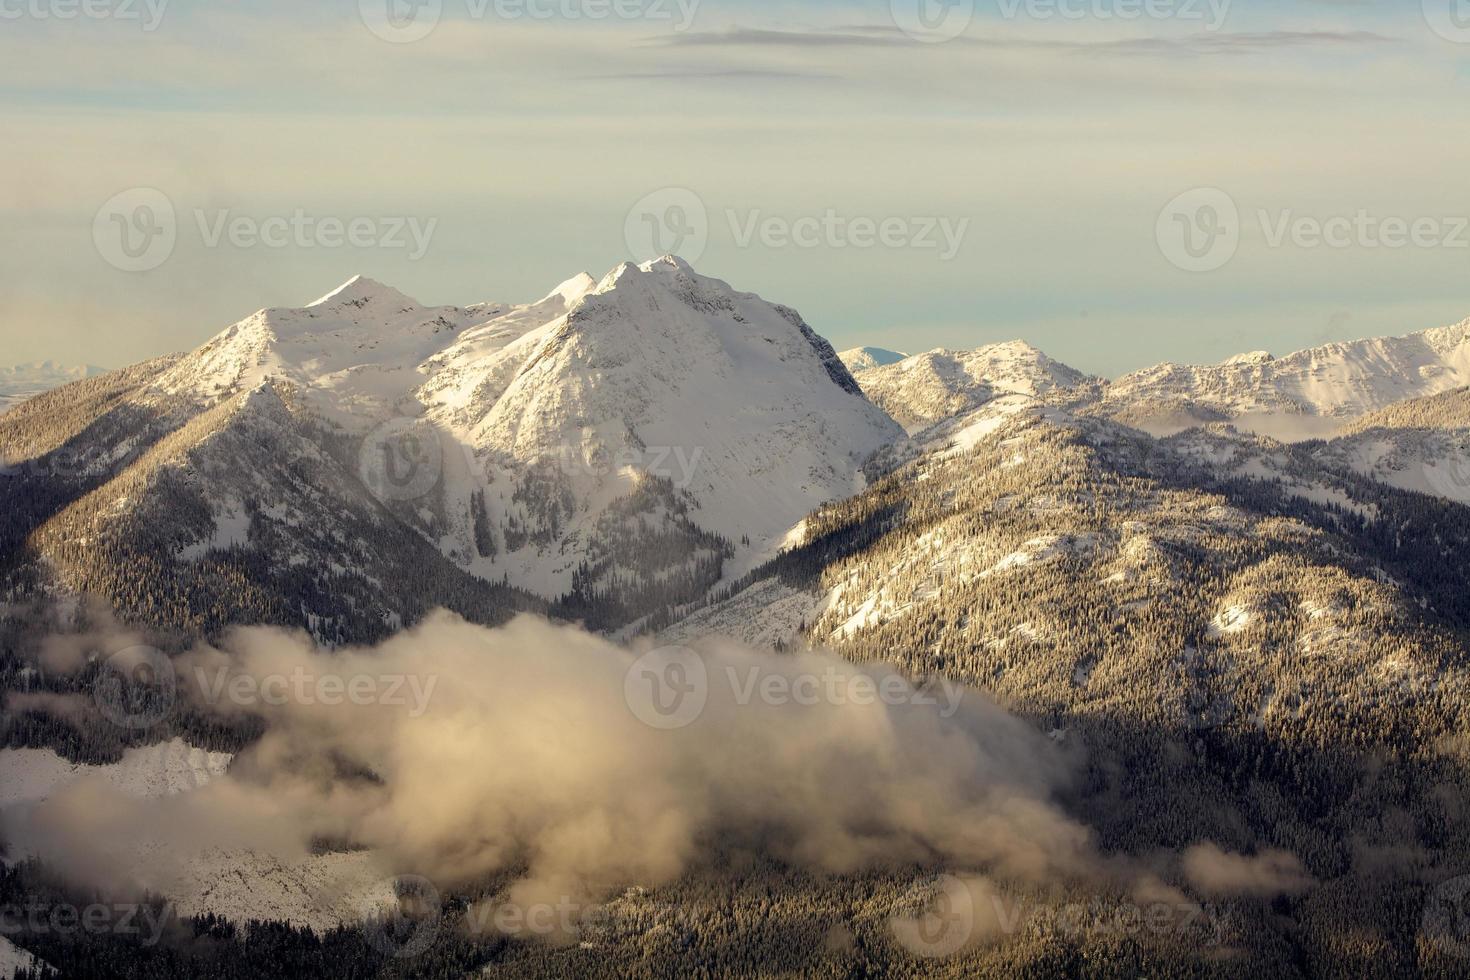 les montagnes monashee colombie britannique canada photo